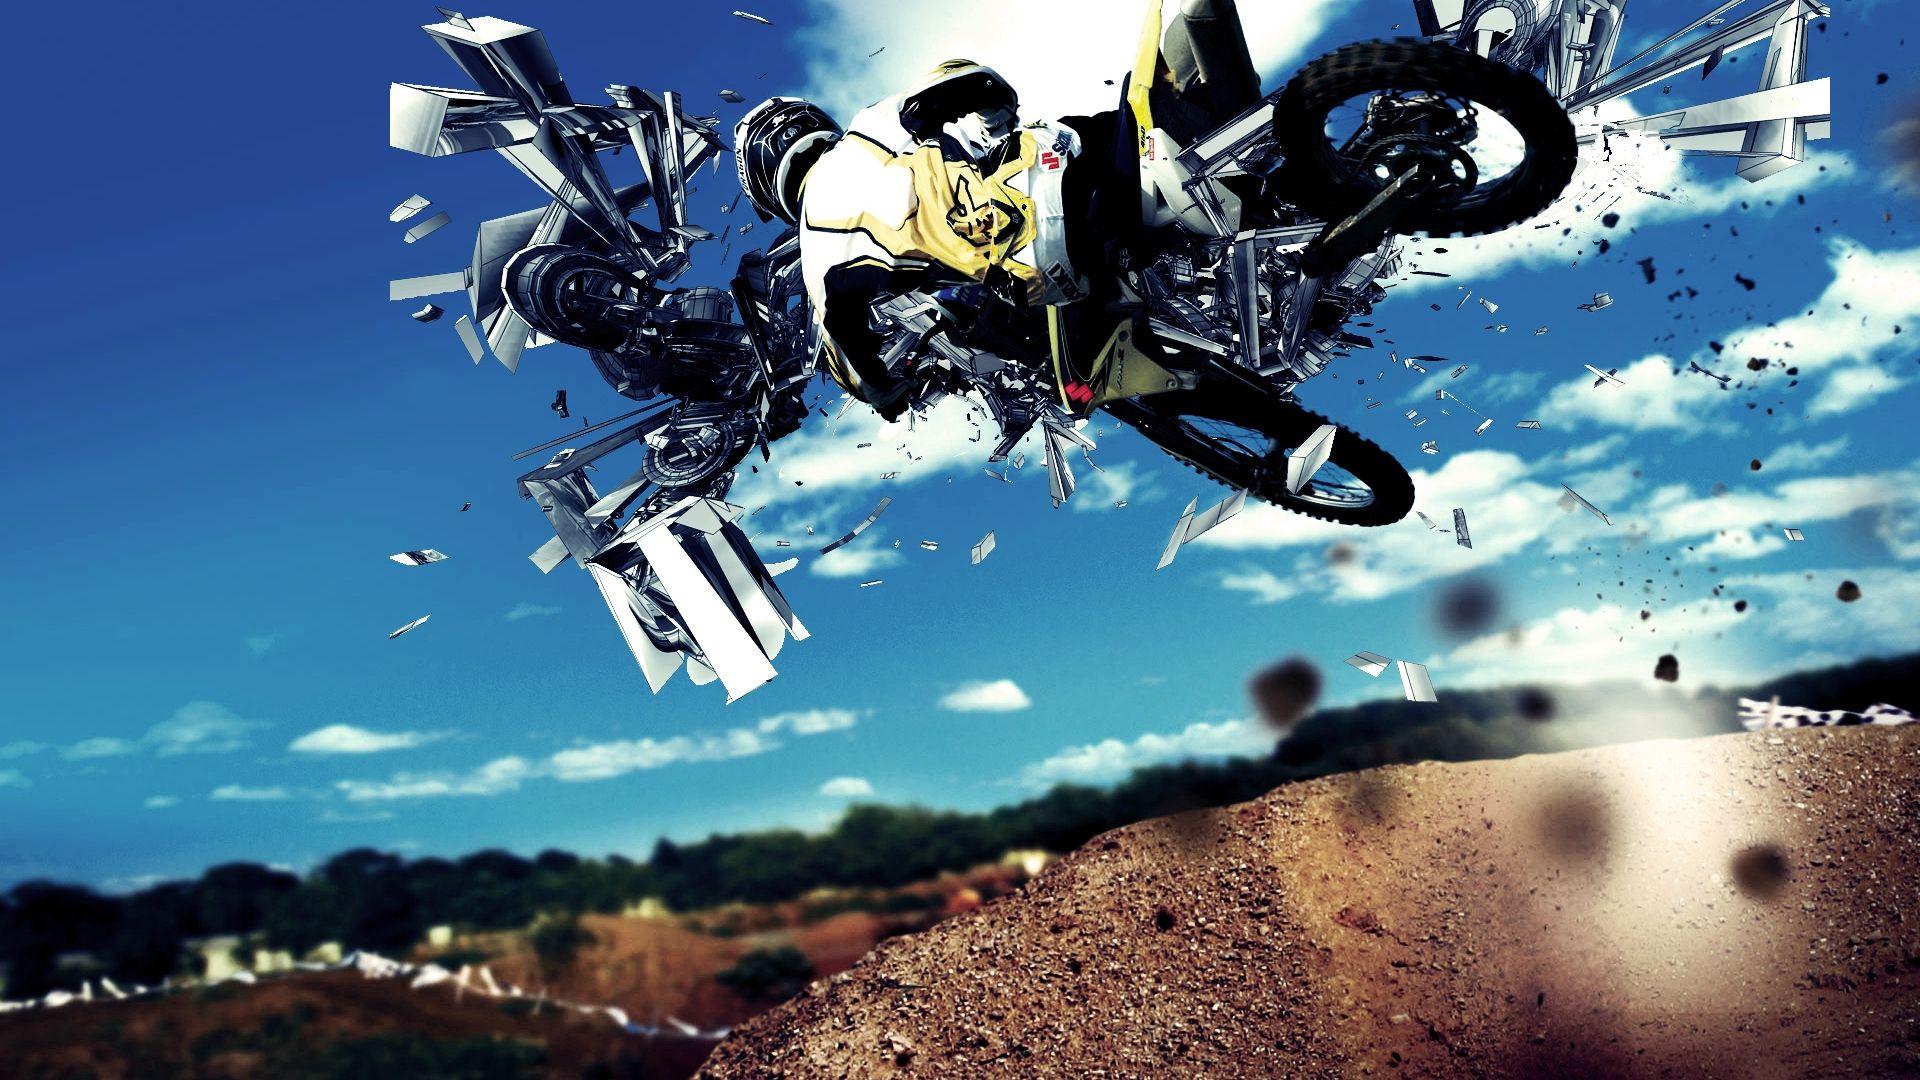 fonds d'écran motocross